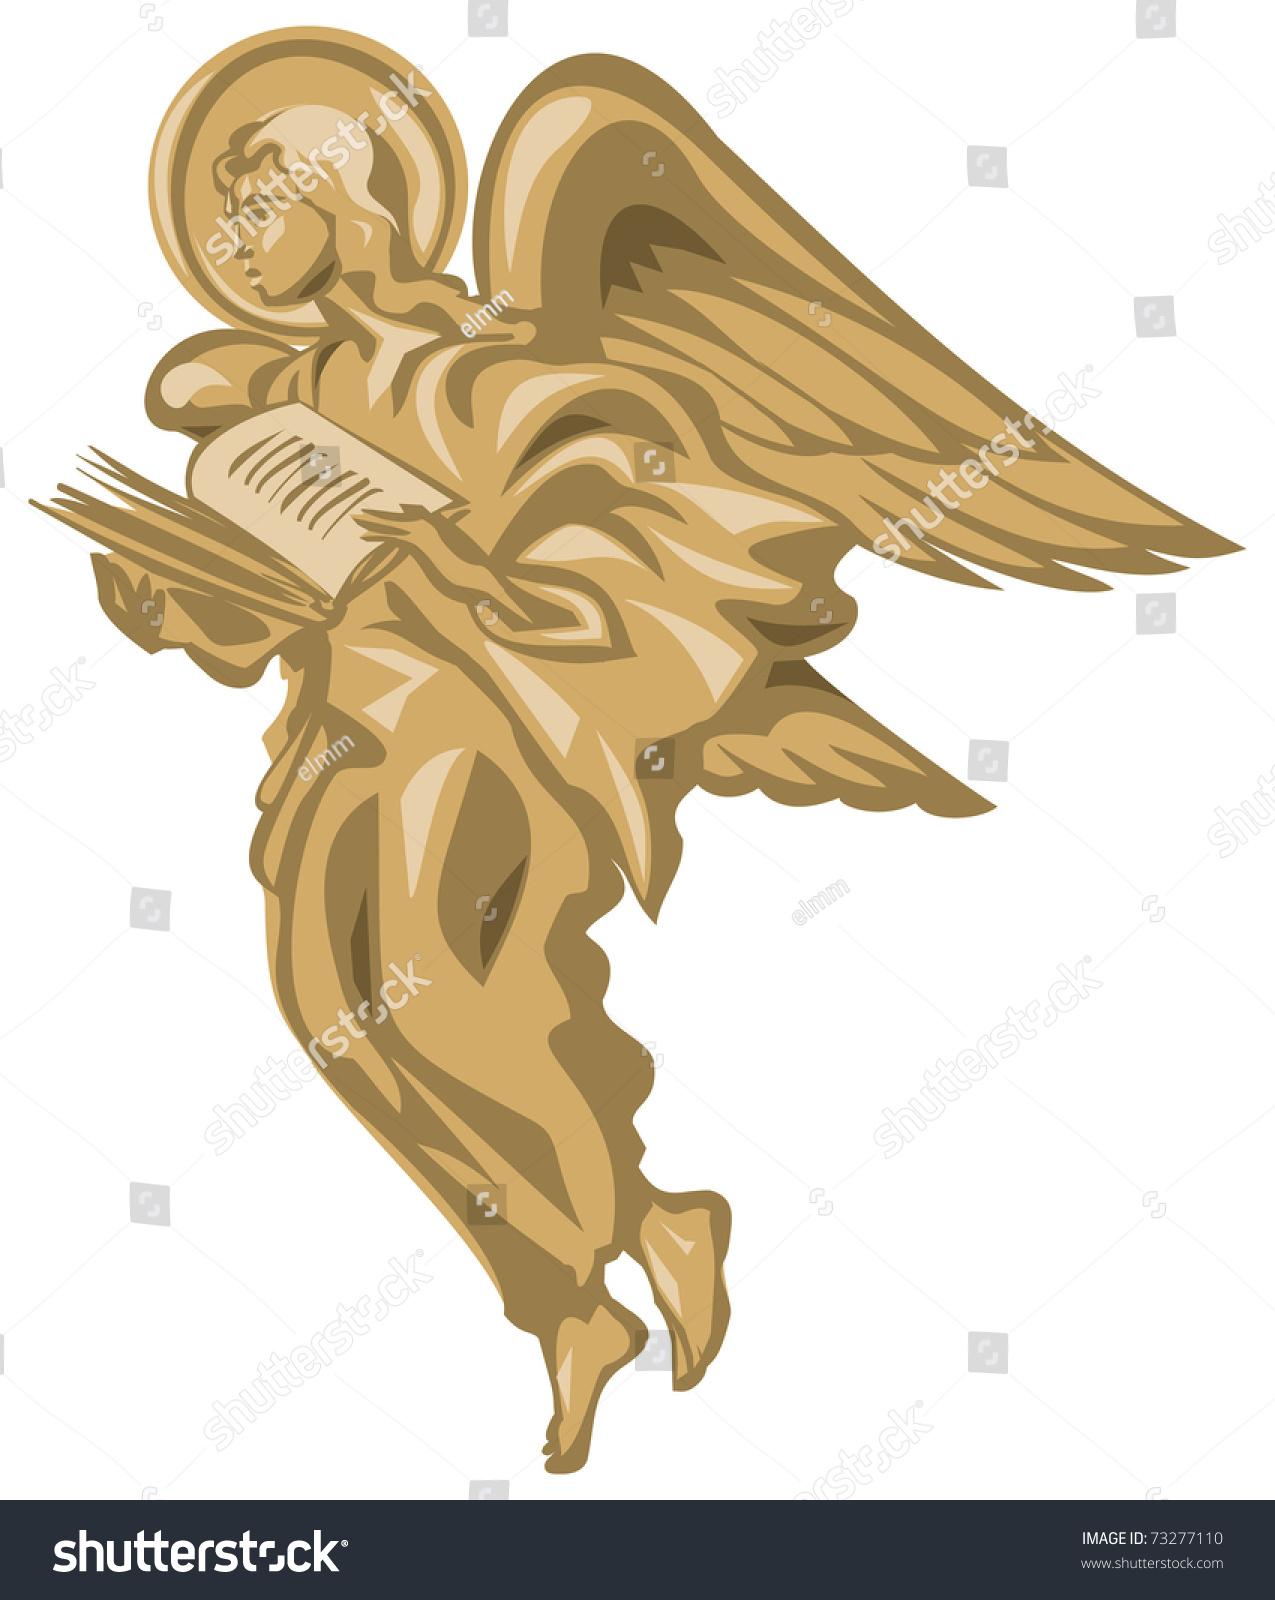 Saint matthew symbol view symbol biocorpaavc